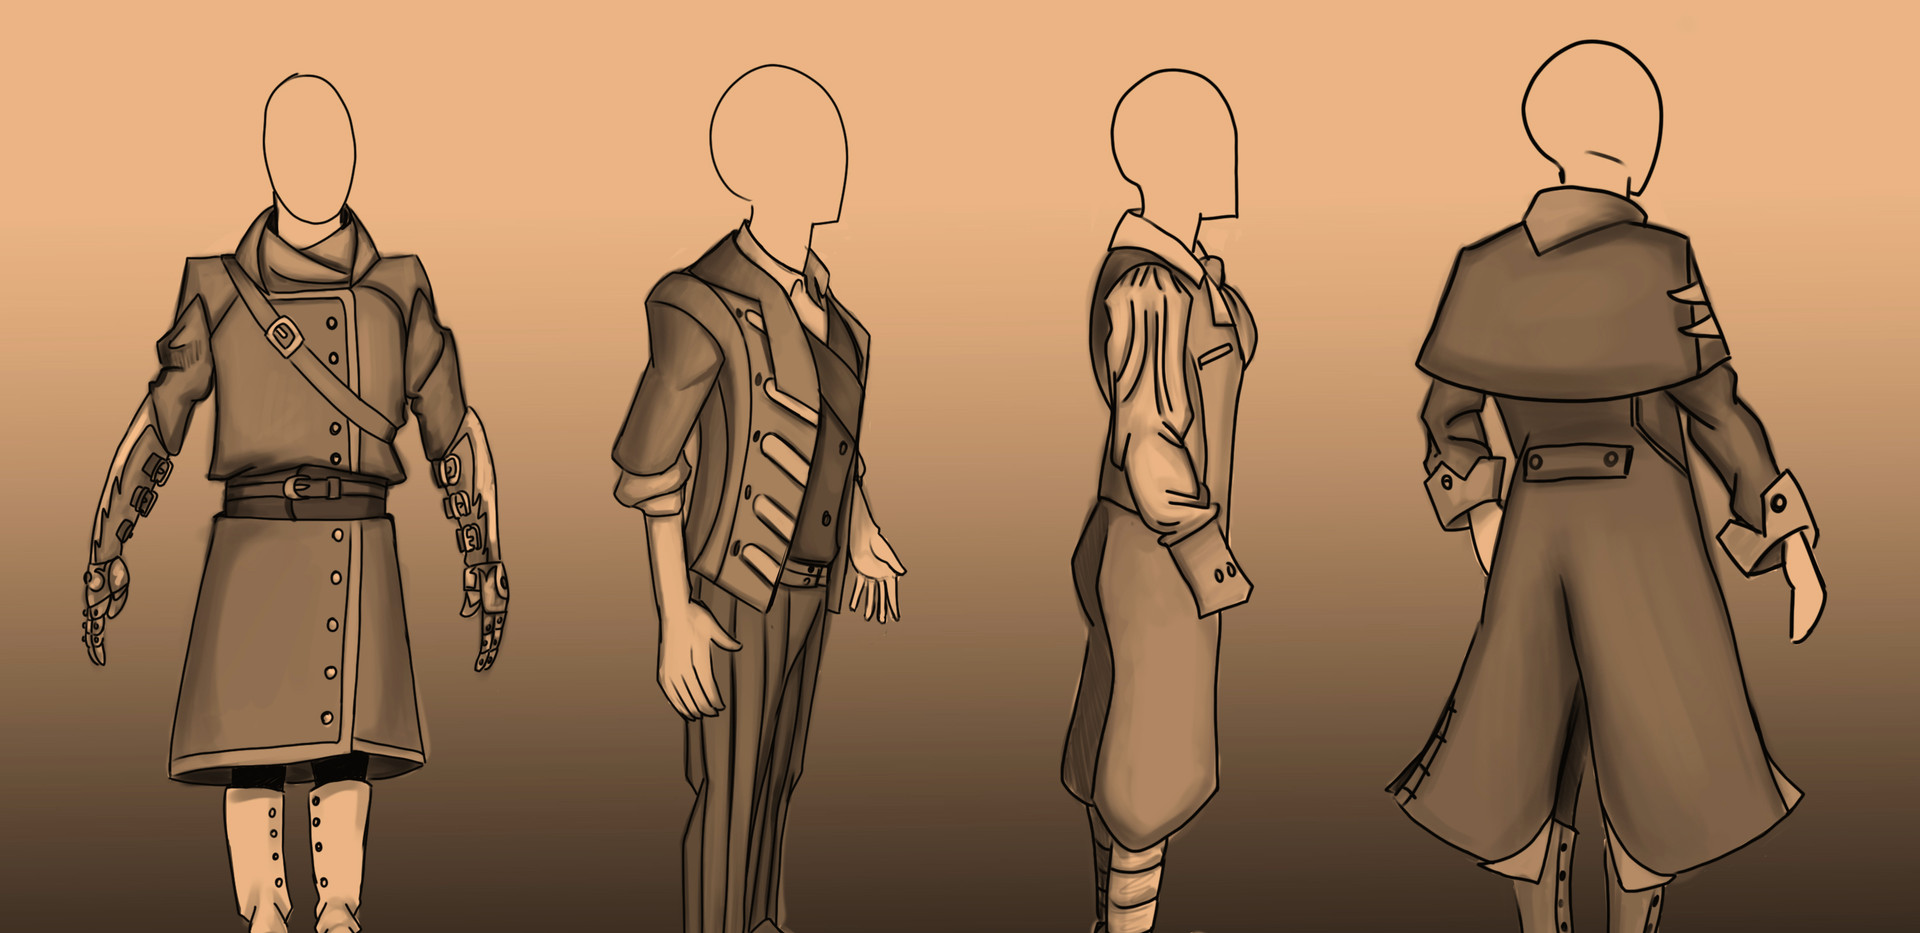 dynamo roughs-male costume 3.jpg